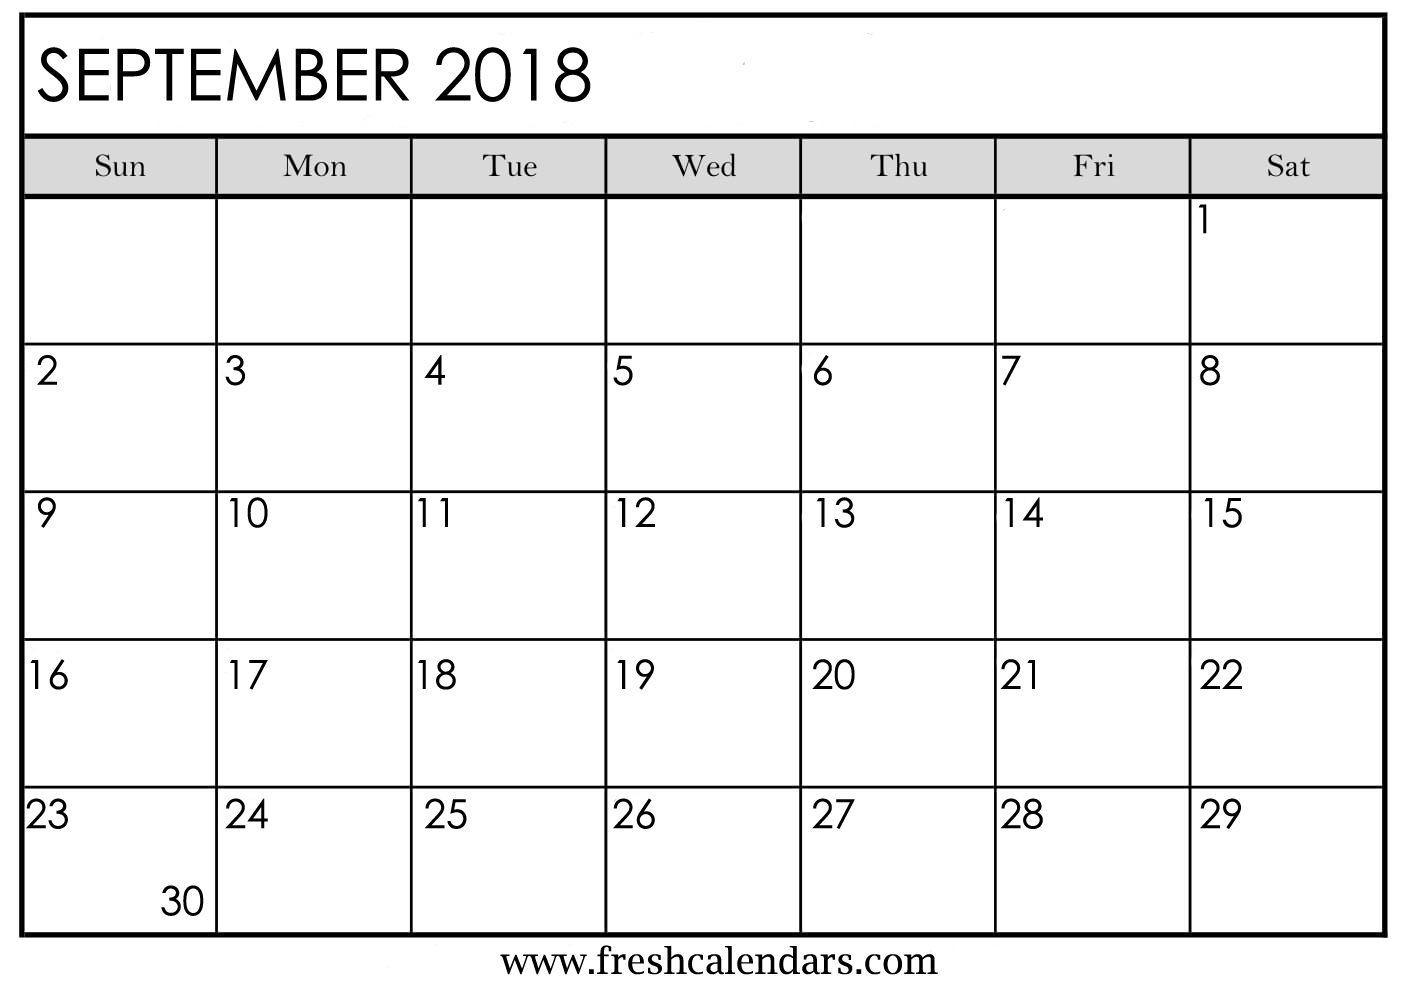 September 2018 Calendar Printable - Fresh Calendars intended for Blank Calendars September Printable